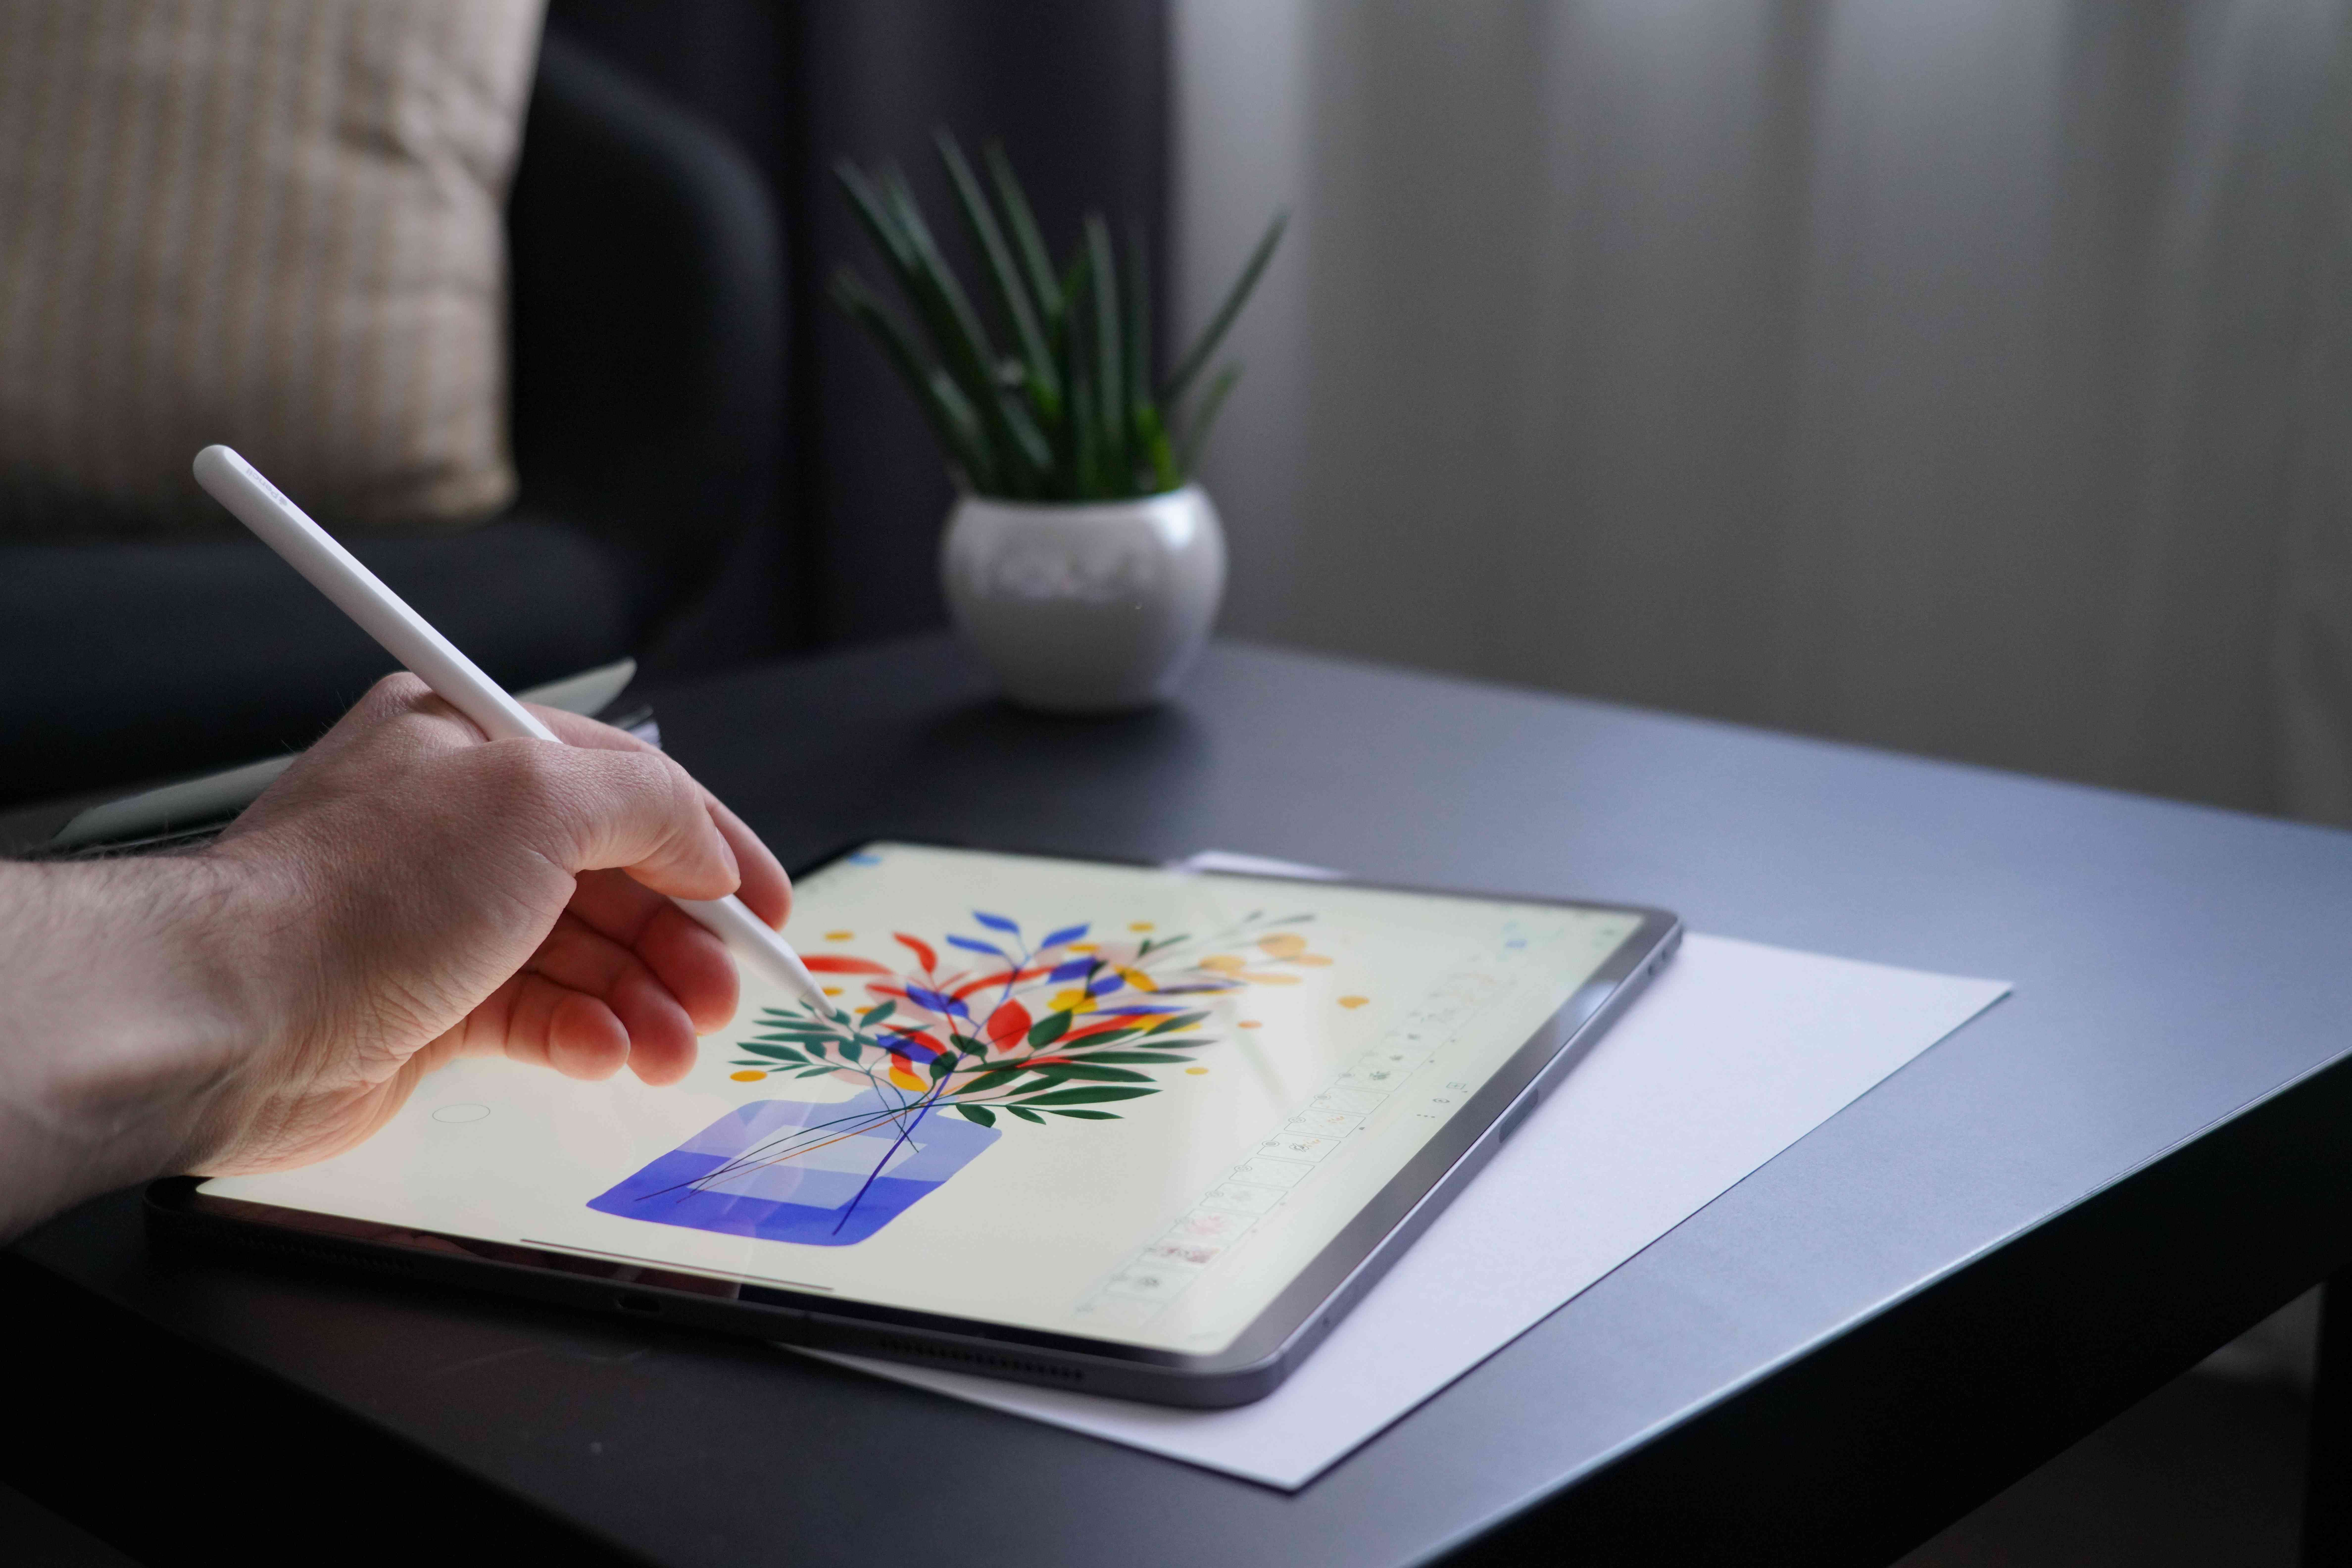 Someone creating an illustration on an iPad Pro.